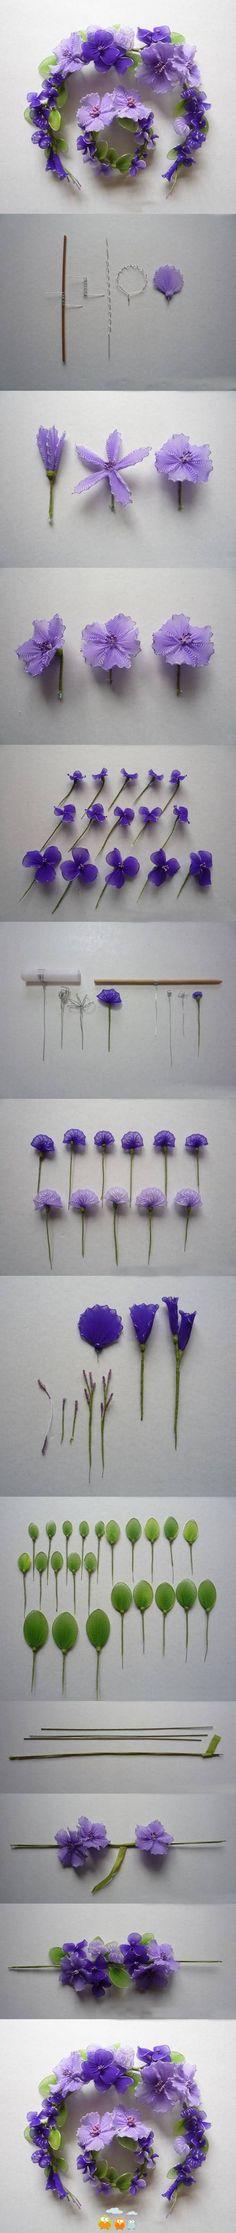 Love it cuz its purple